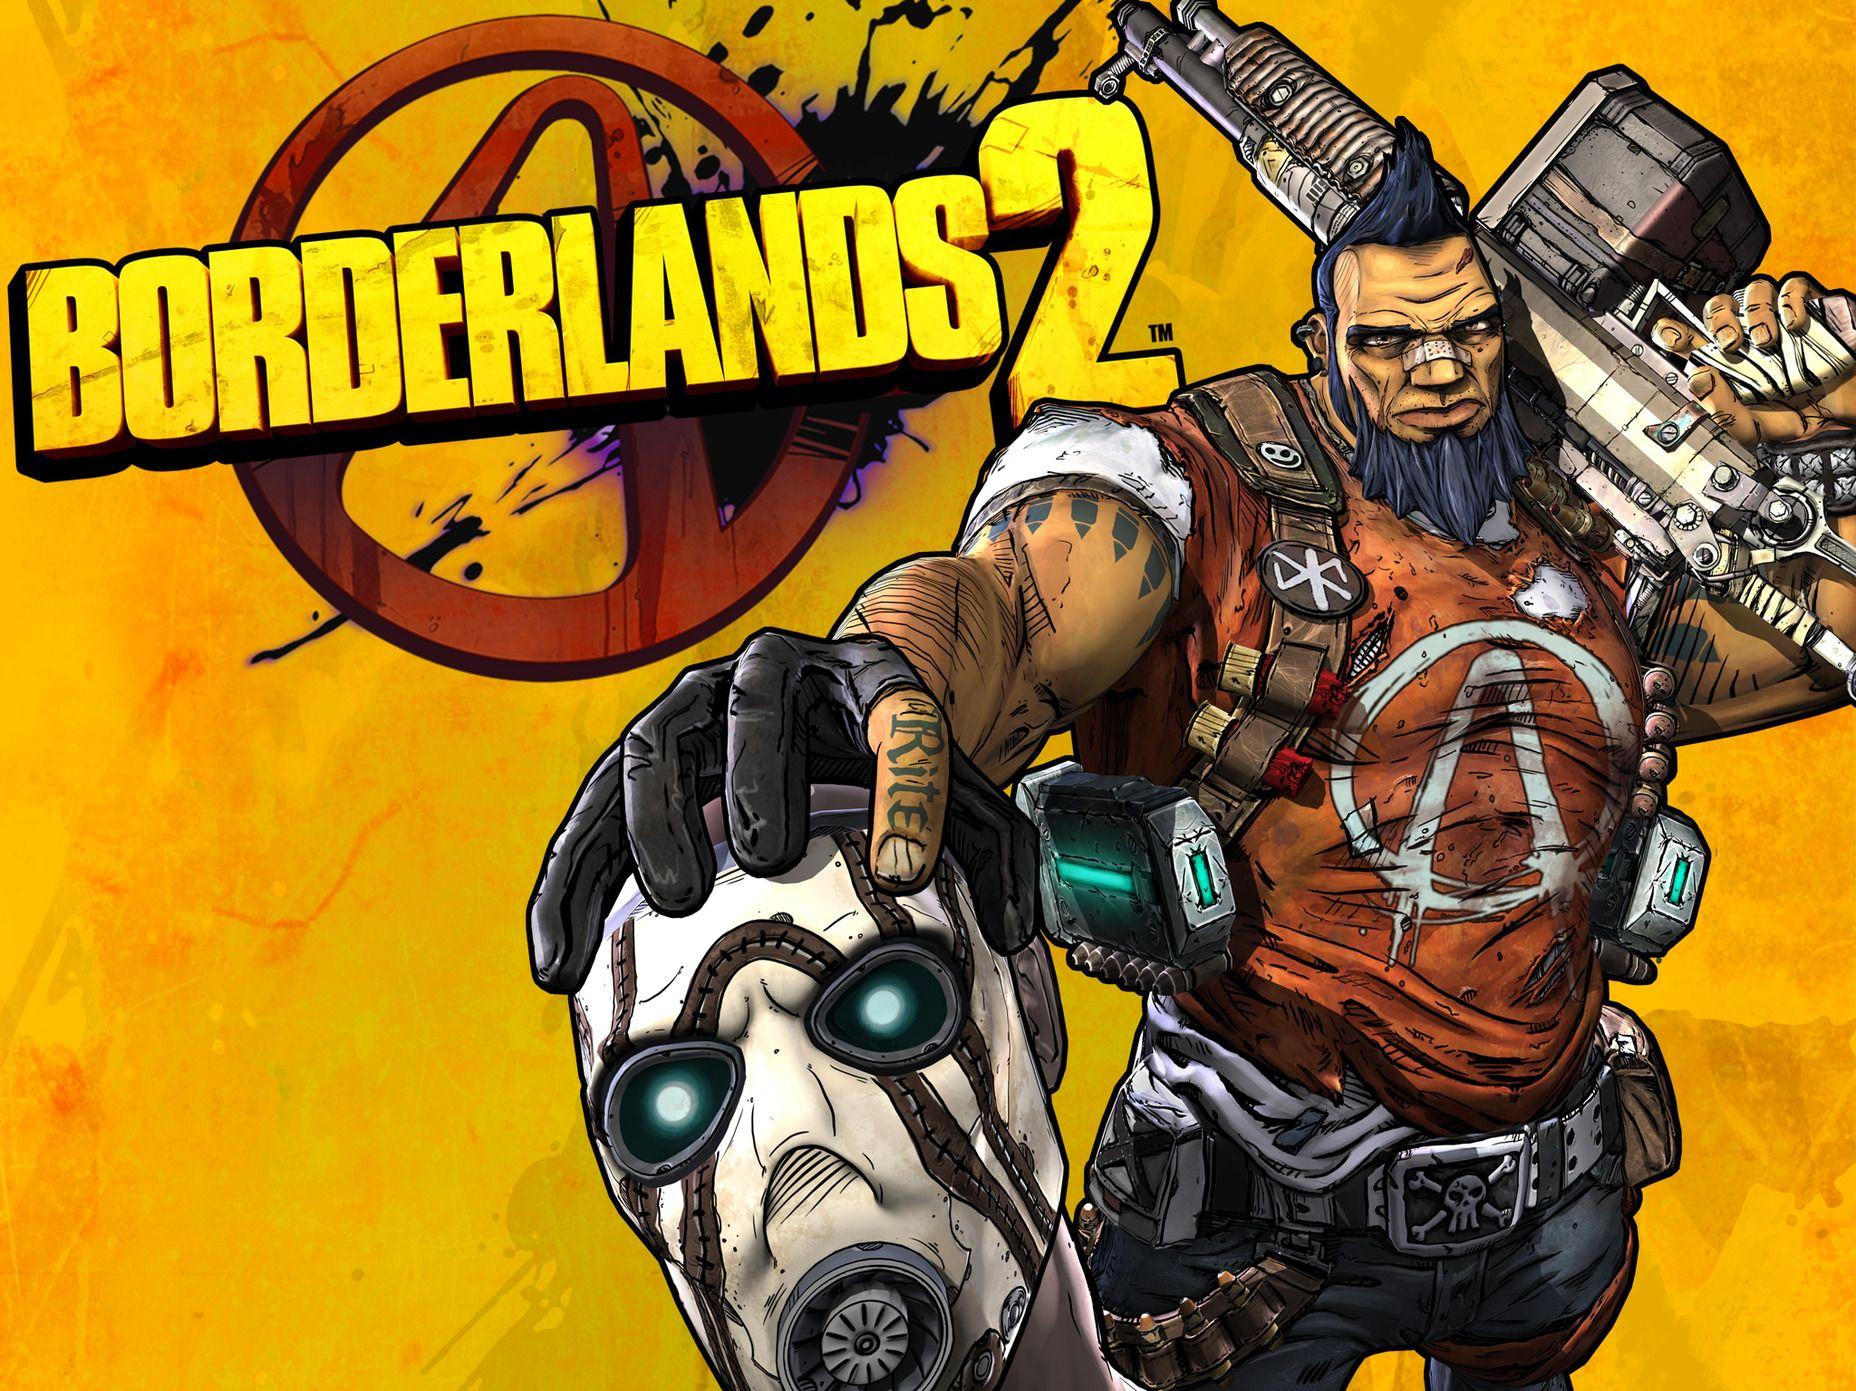 Borderlands 2 Ps3 Wallpaper Borderlands Borderlands 2 Game Wallpaper